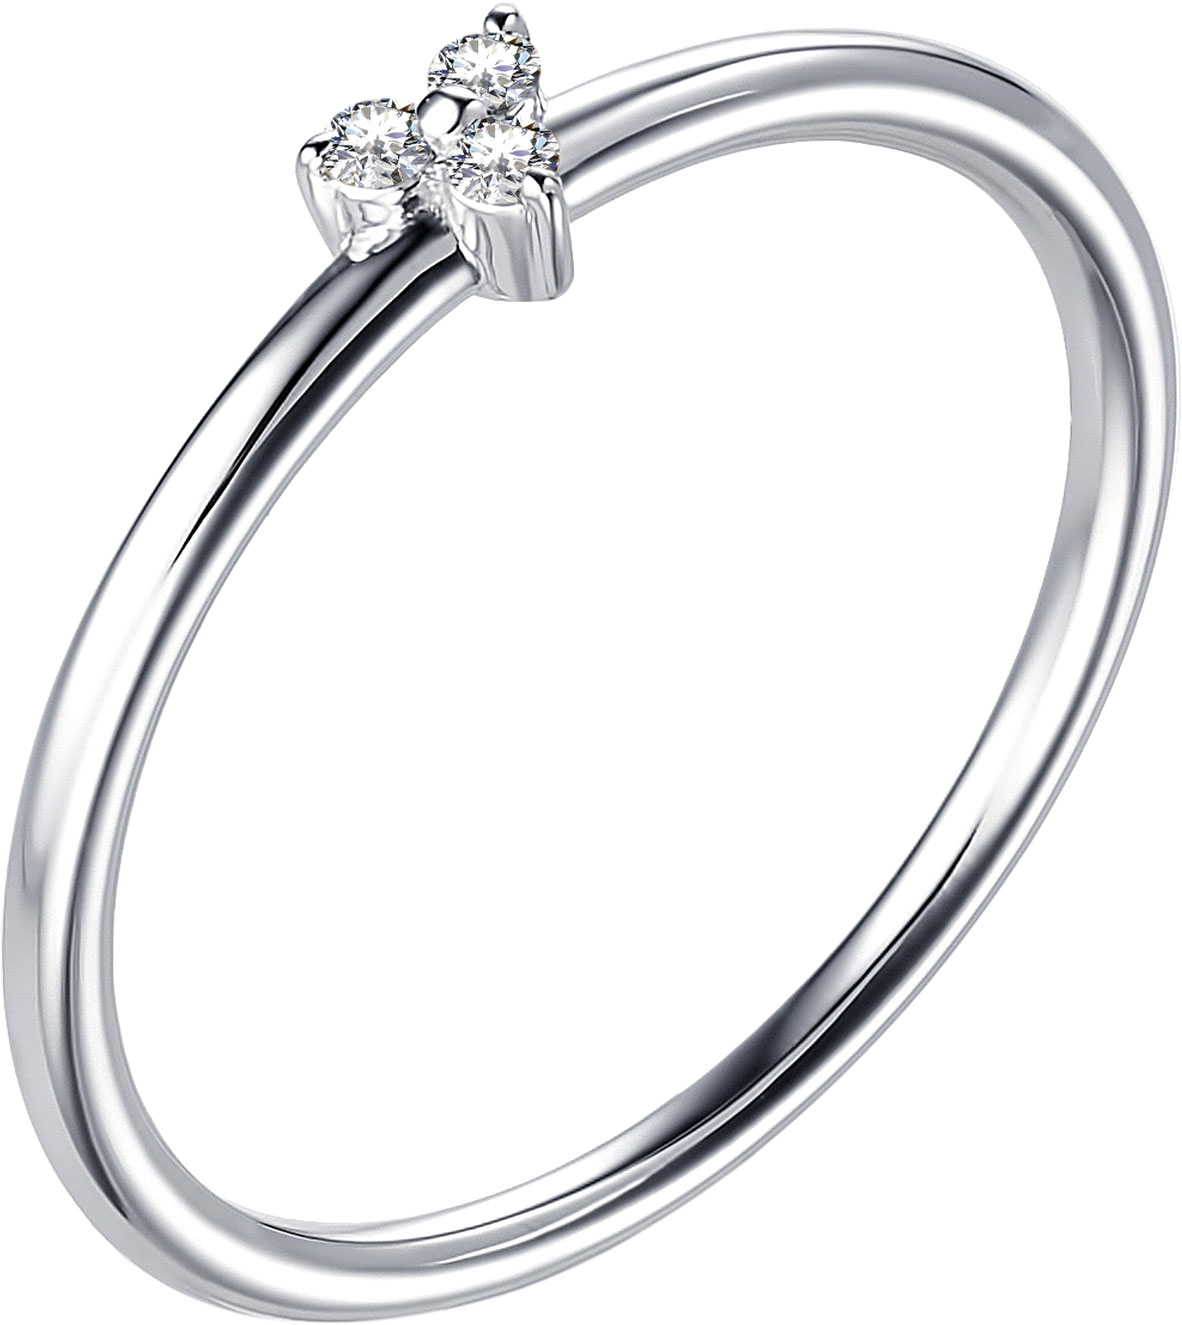 Кольца Алькор 13262-200